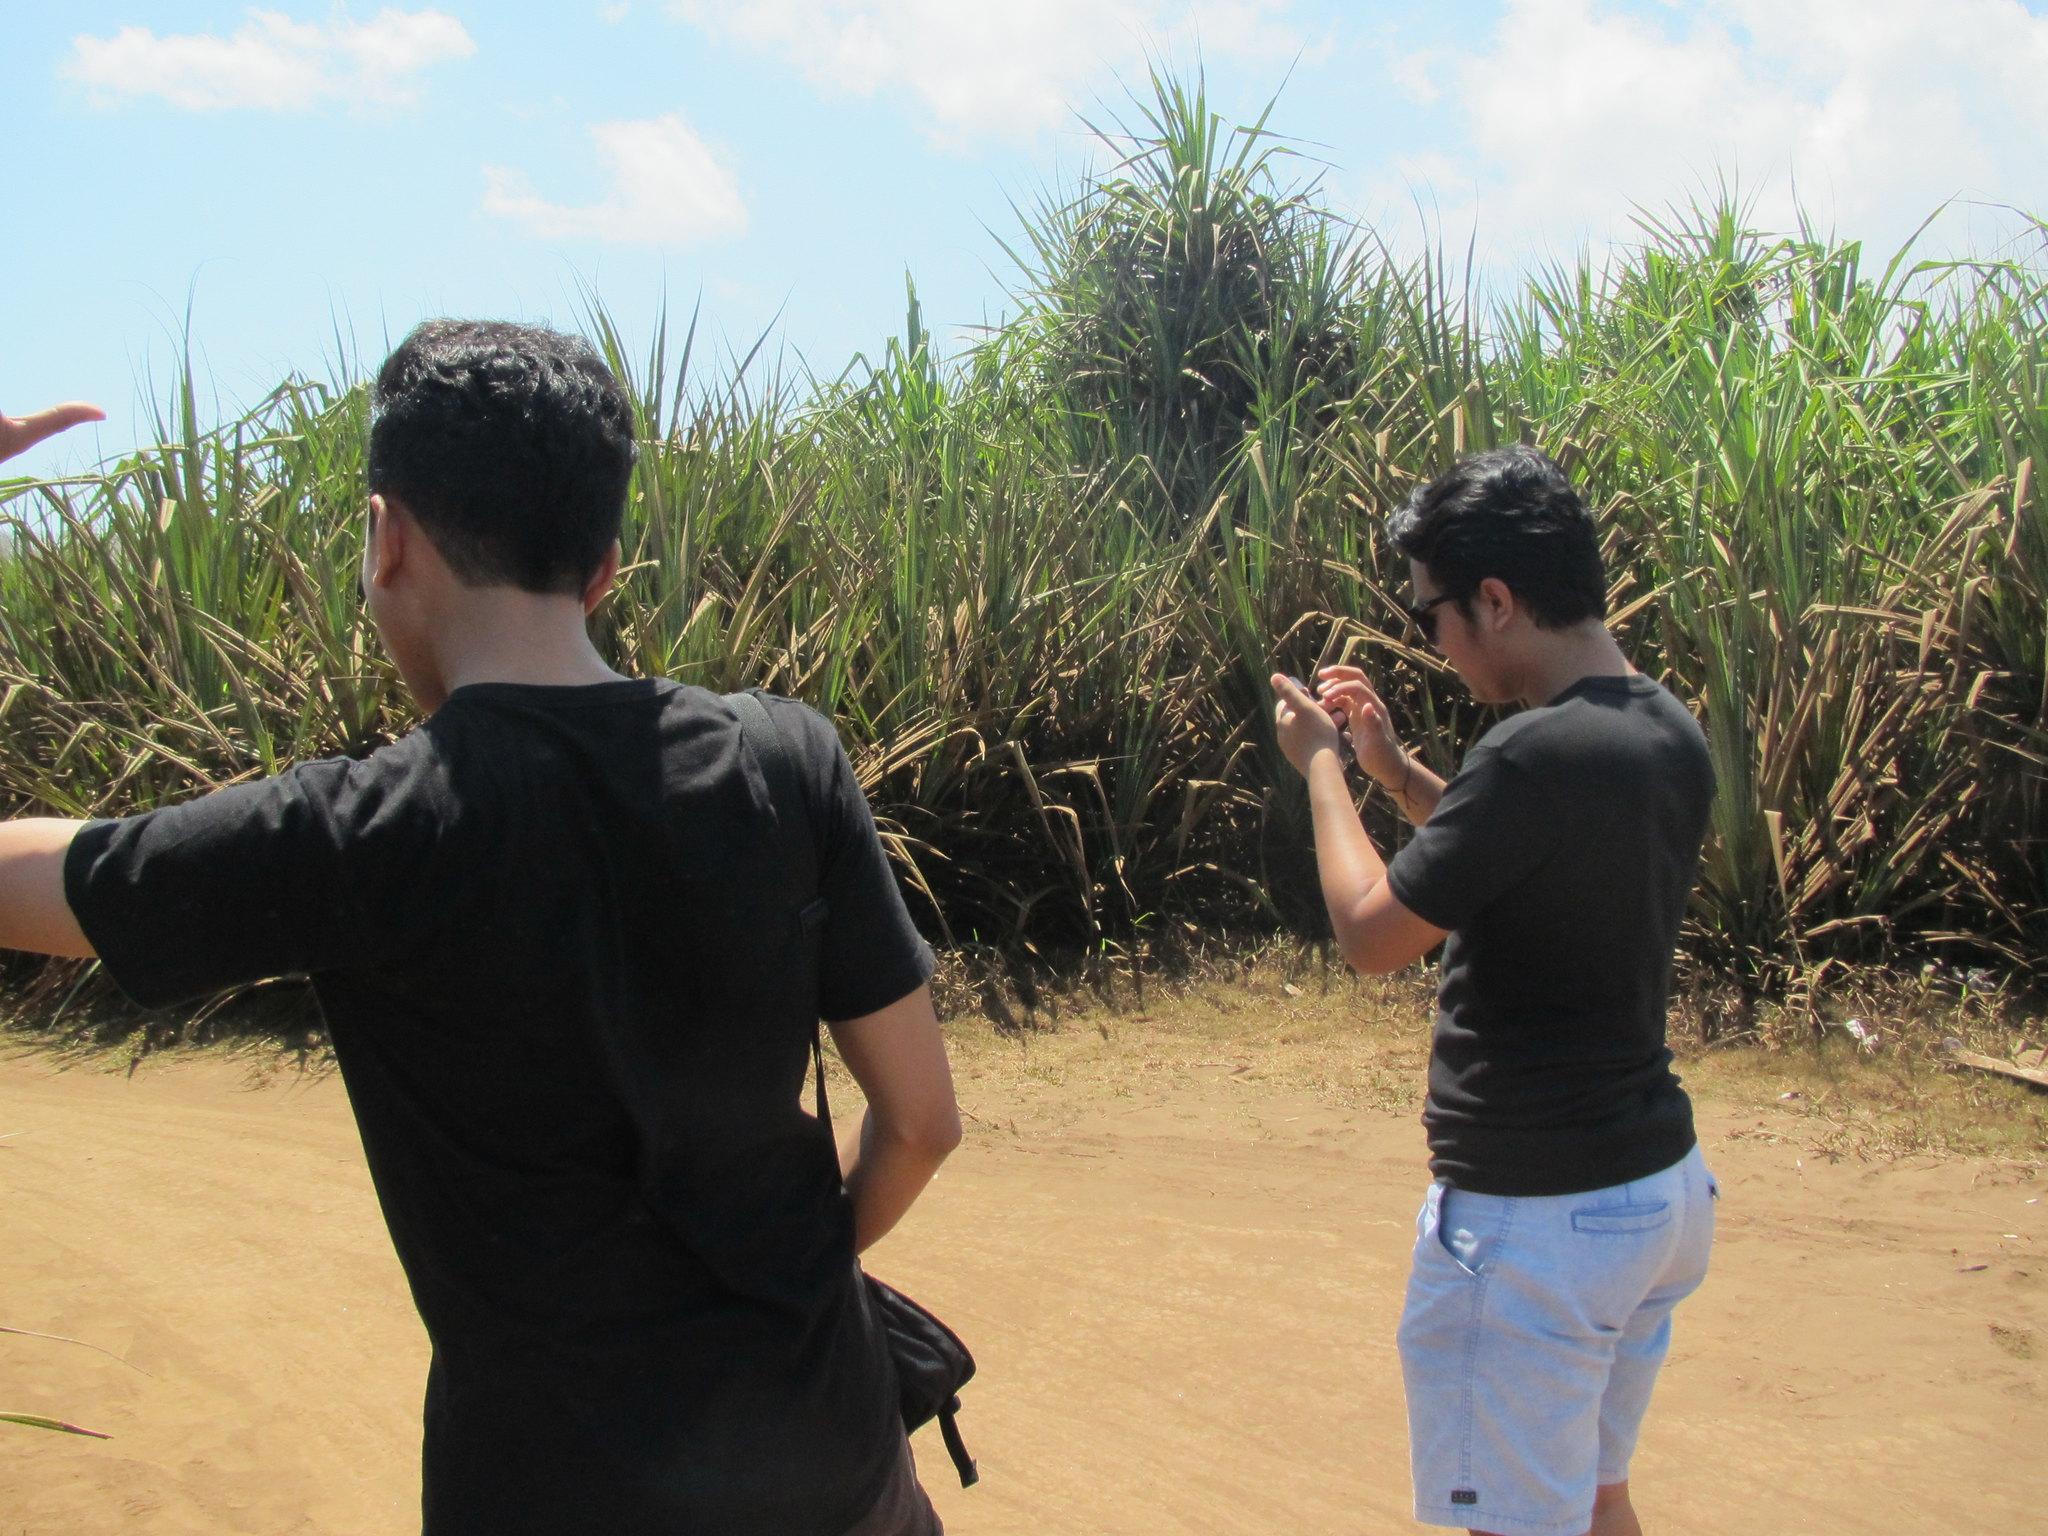 Kabur ke Nusa Lembongan 3